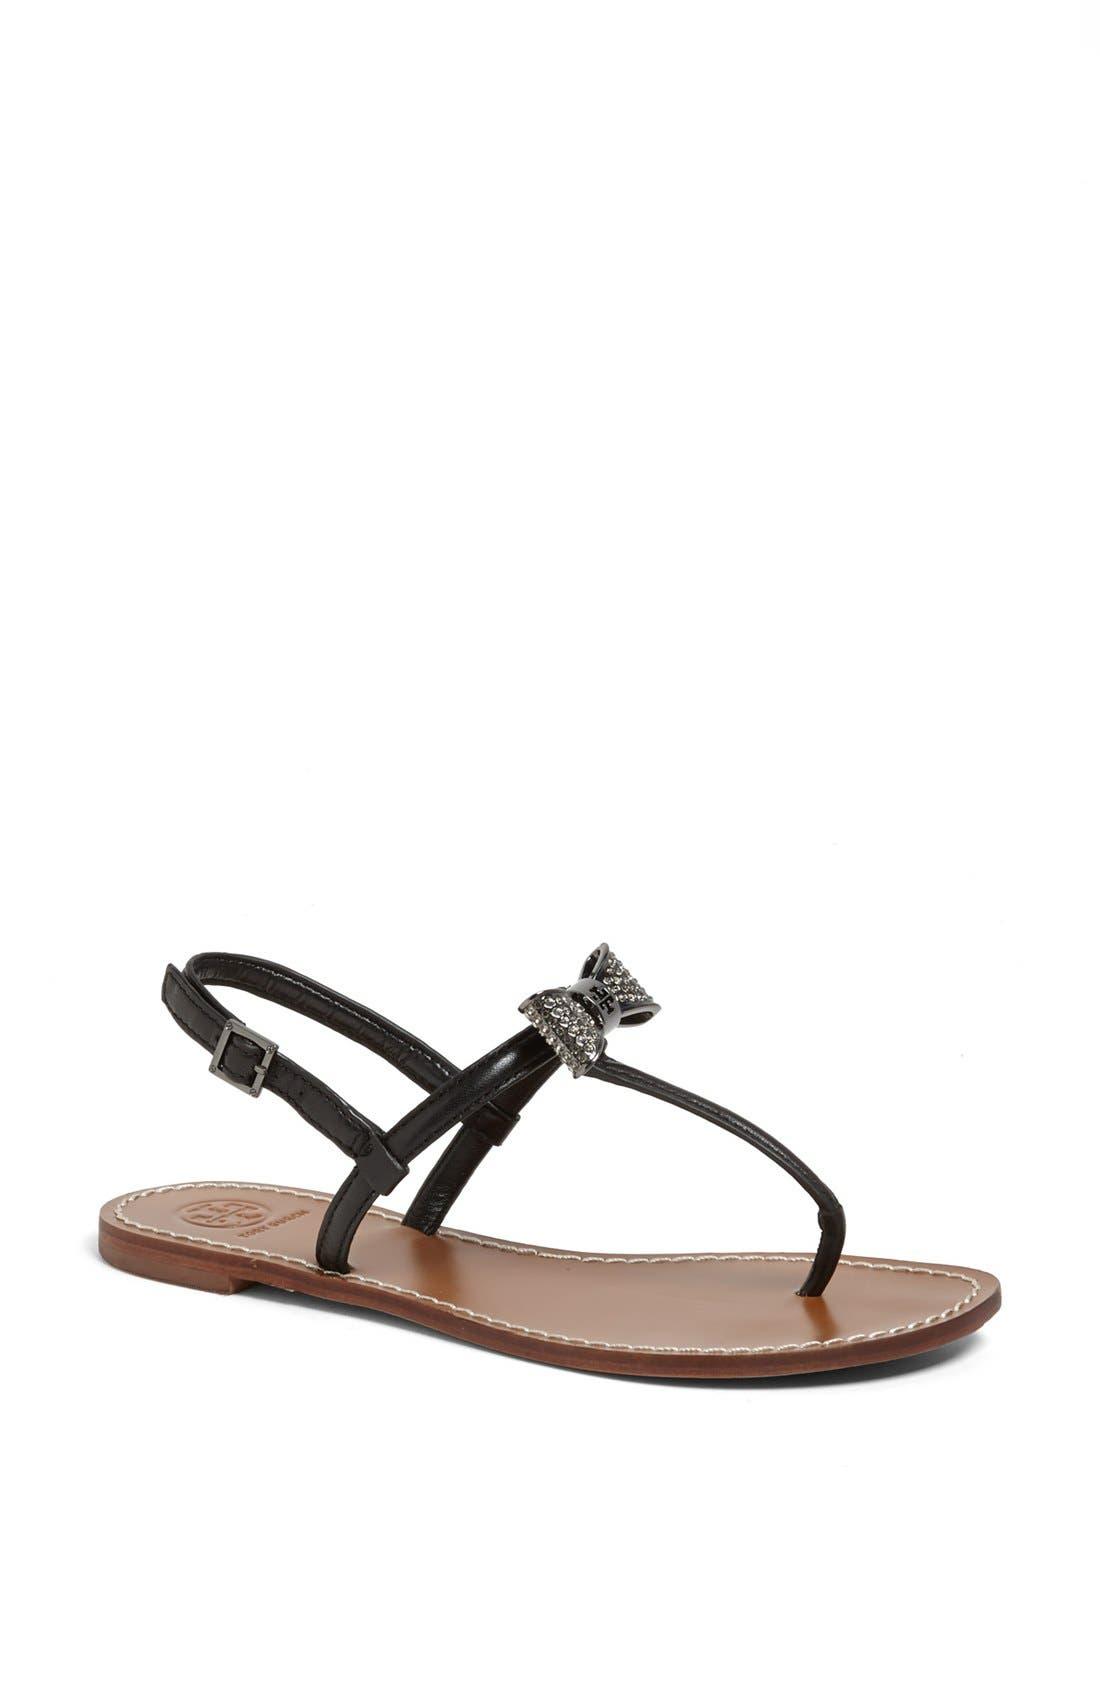 Alternate Image 1 Selected - Tory Burch 'Bryn' Sandal